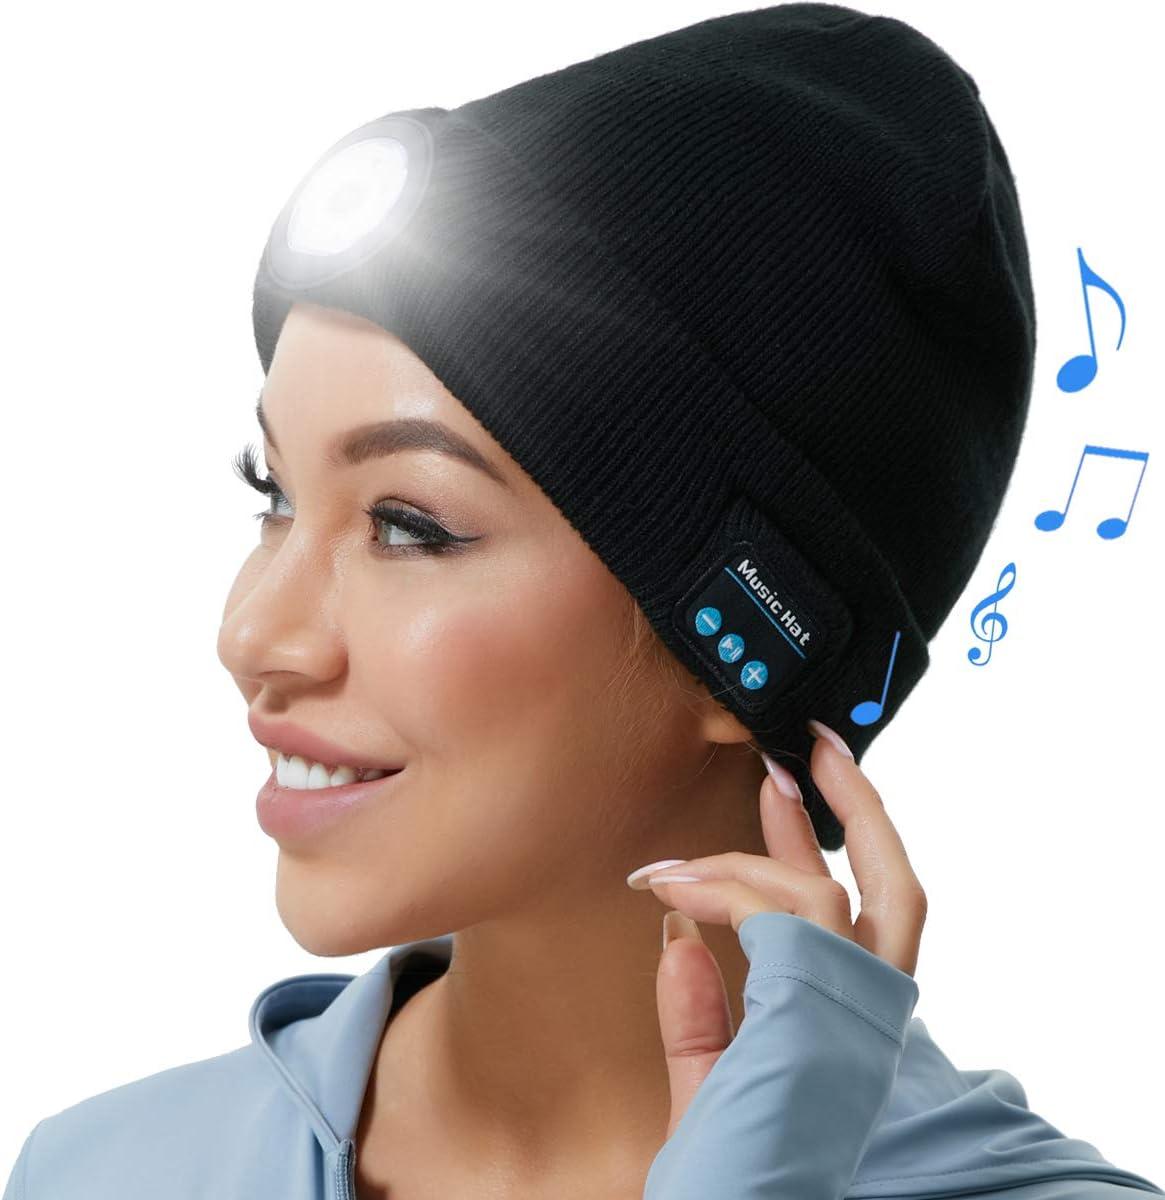 Rechargeable Outdoor Running Flashlight hat for Men Headlamp Bluetooth Beanie Hat for Men Women Winter Music Sprots LED Lights Hat Women Teen Boys Girls